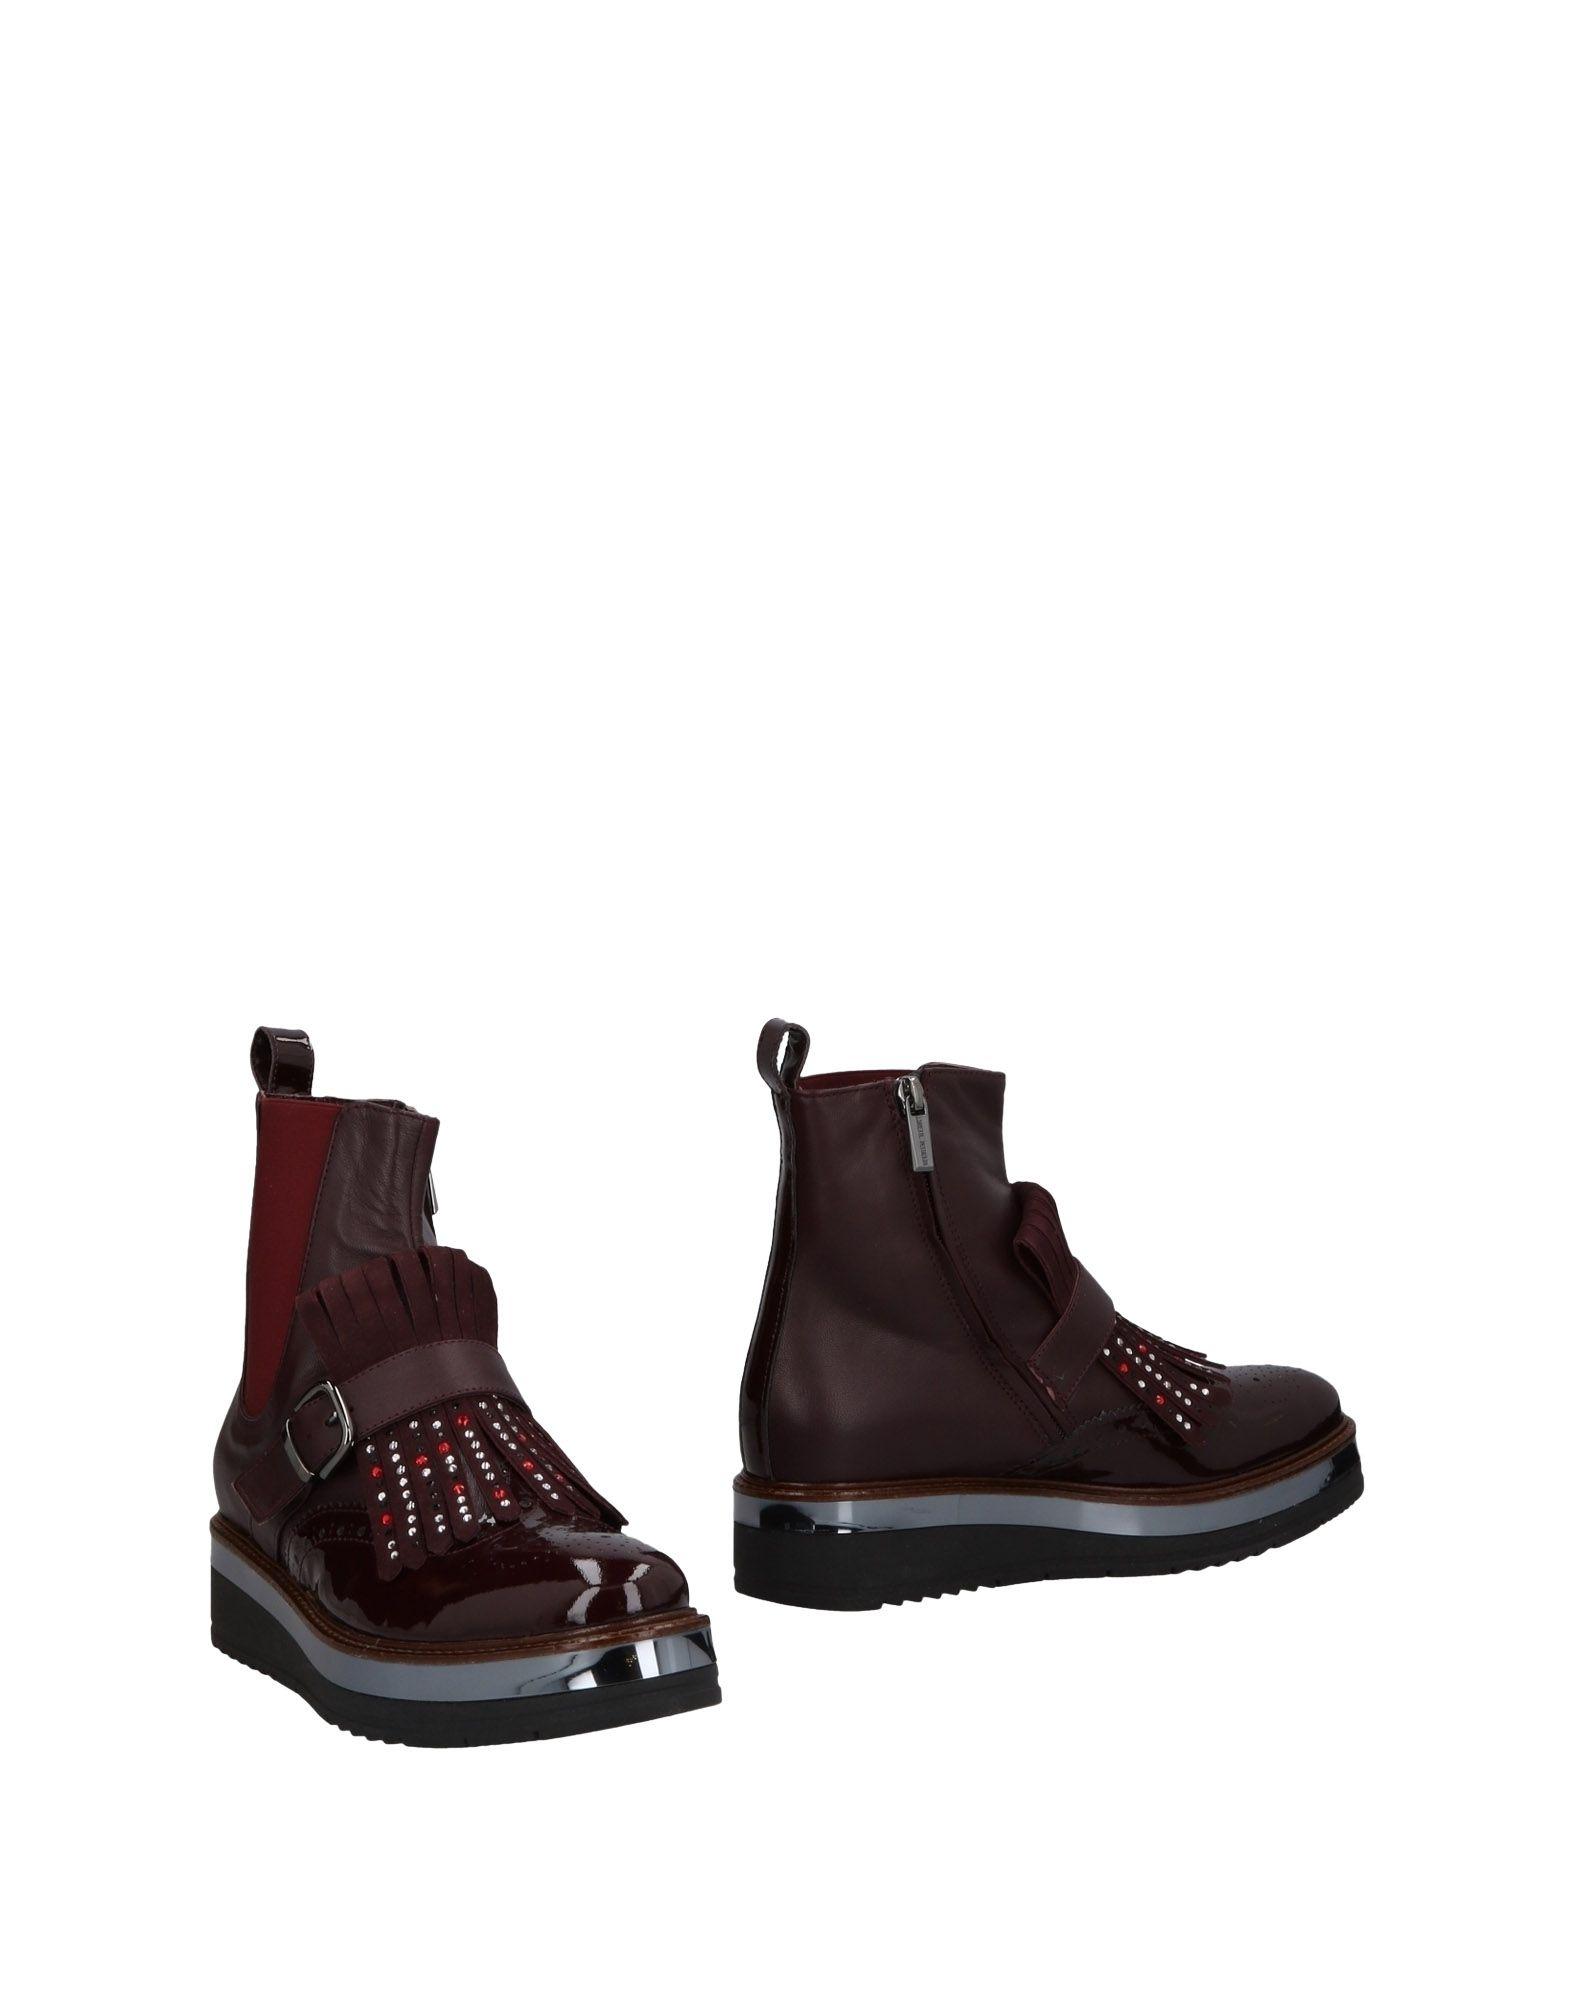 Loretta Pettinari Ankle Boot Ankle - Women Loretta Pettinari Ankle Boot Boots online on  Australia - 11471823ID 3333ff